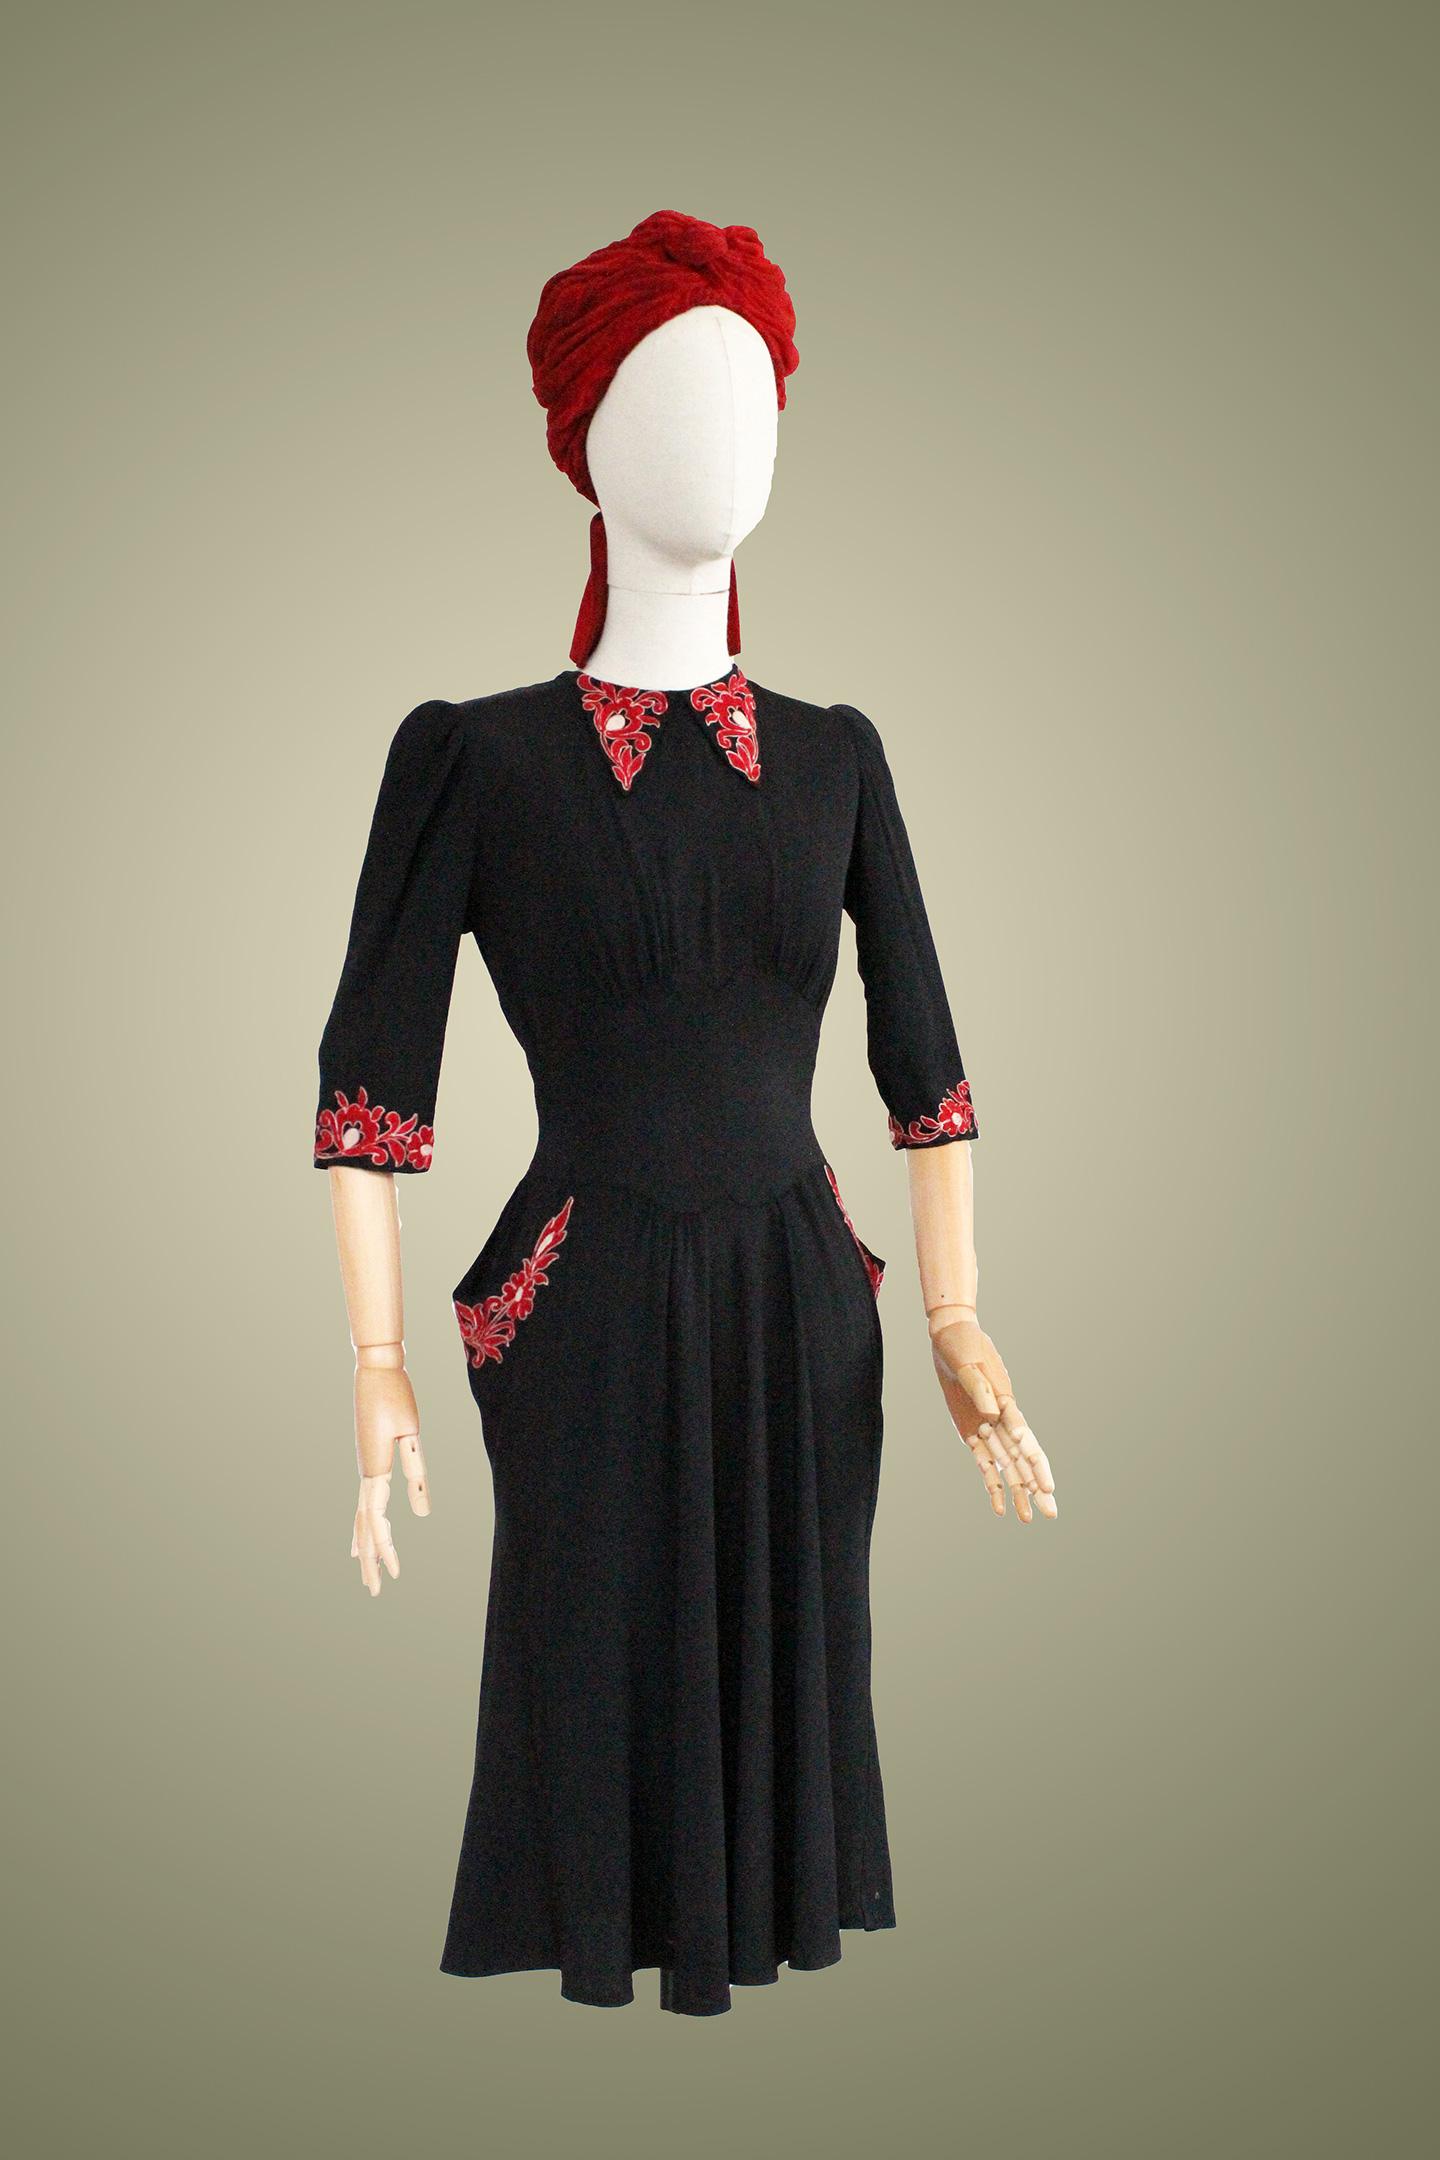 1930 1940 la compagnie du costume. Black Bedroom Furniture Sets. Home Design Ideas